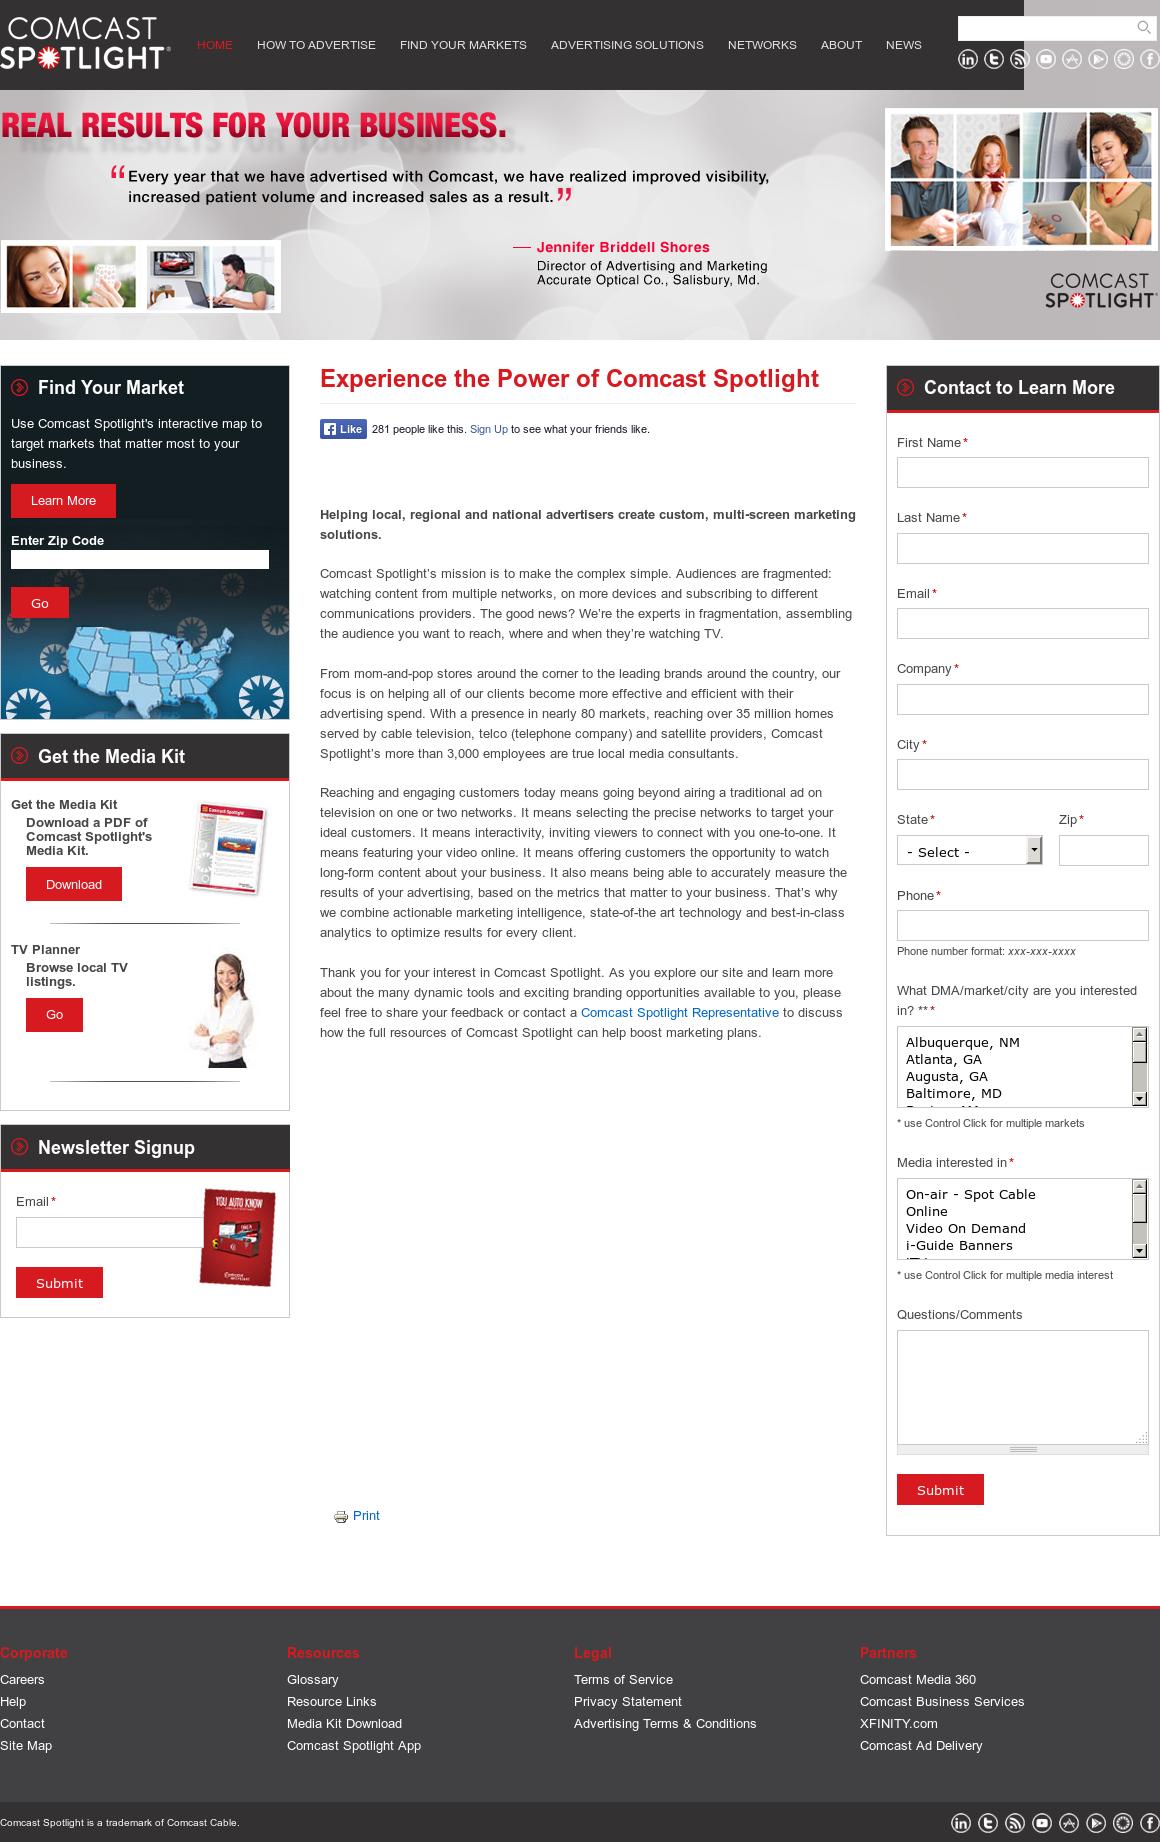 Comcast Spotlight Competitors, Revenue and Employees - Owler